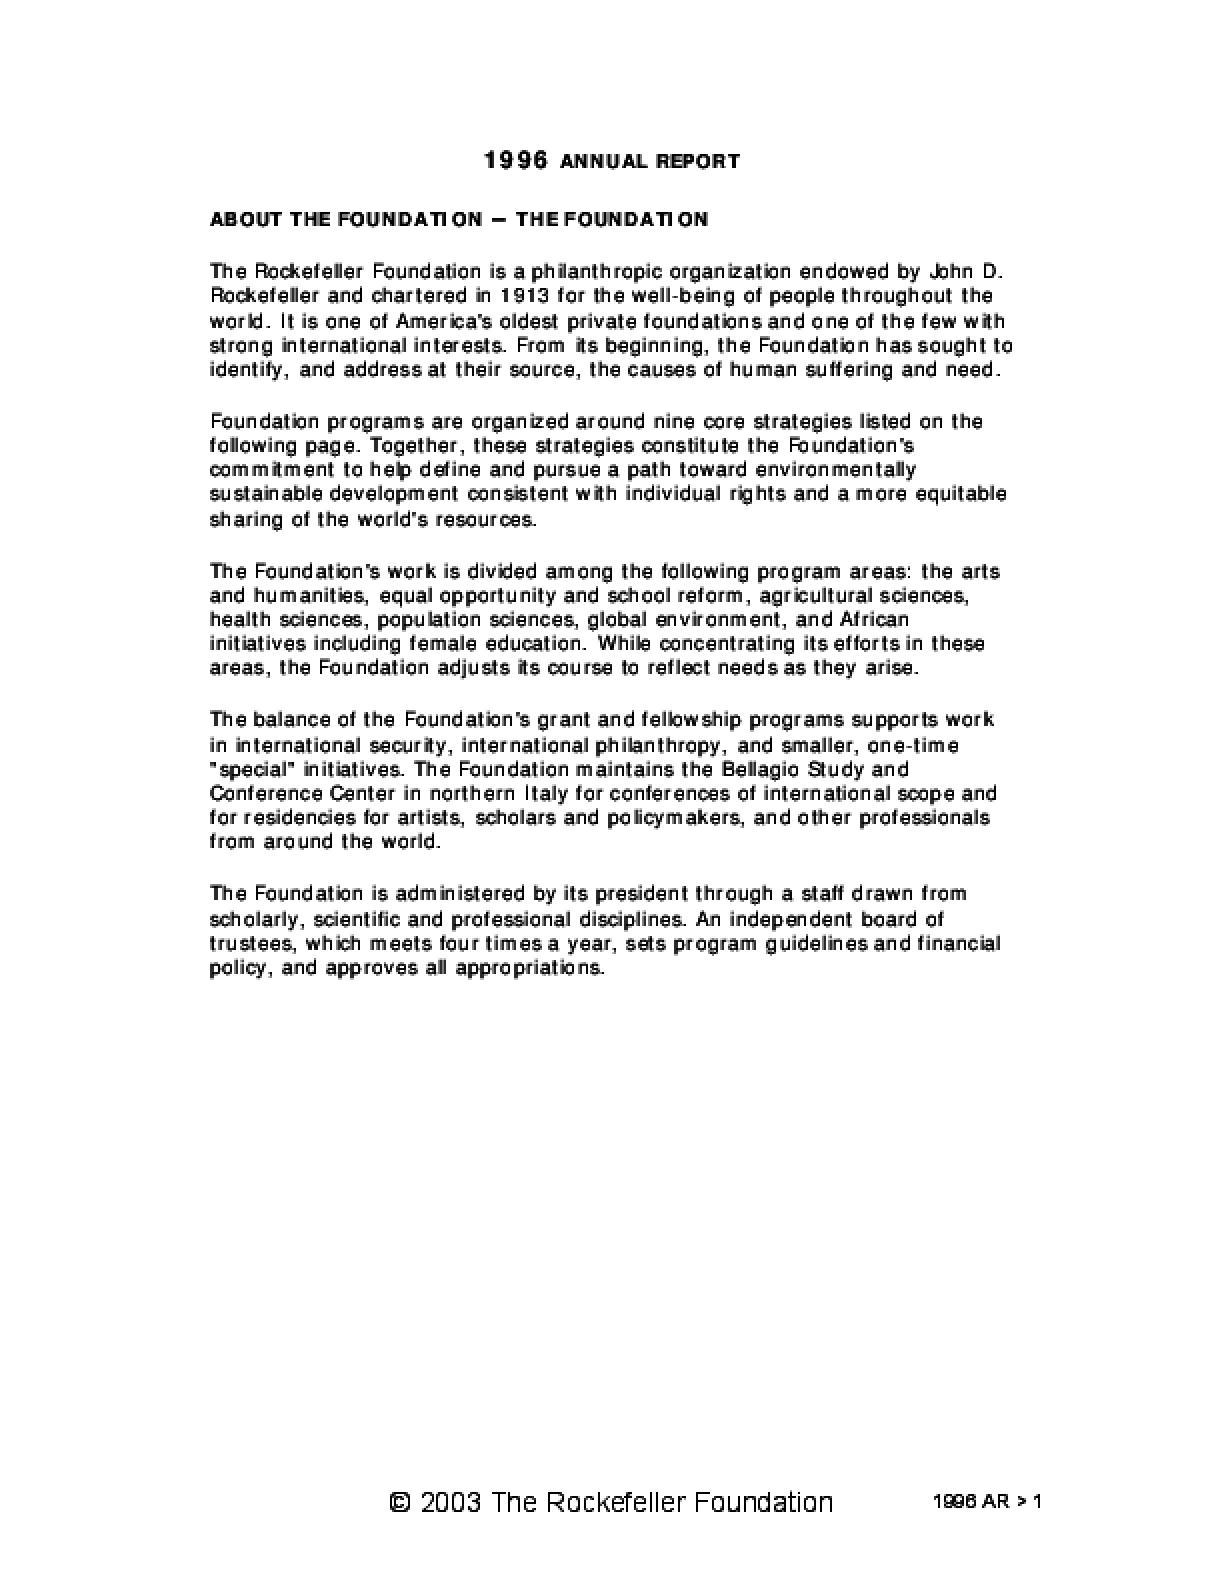 Rockefeller Foundation - 1996 Annual Report